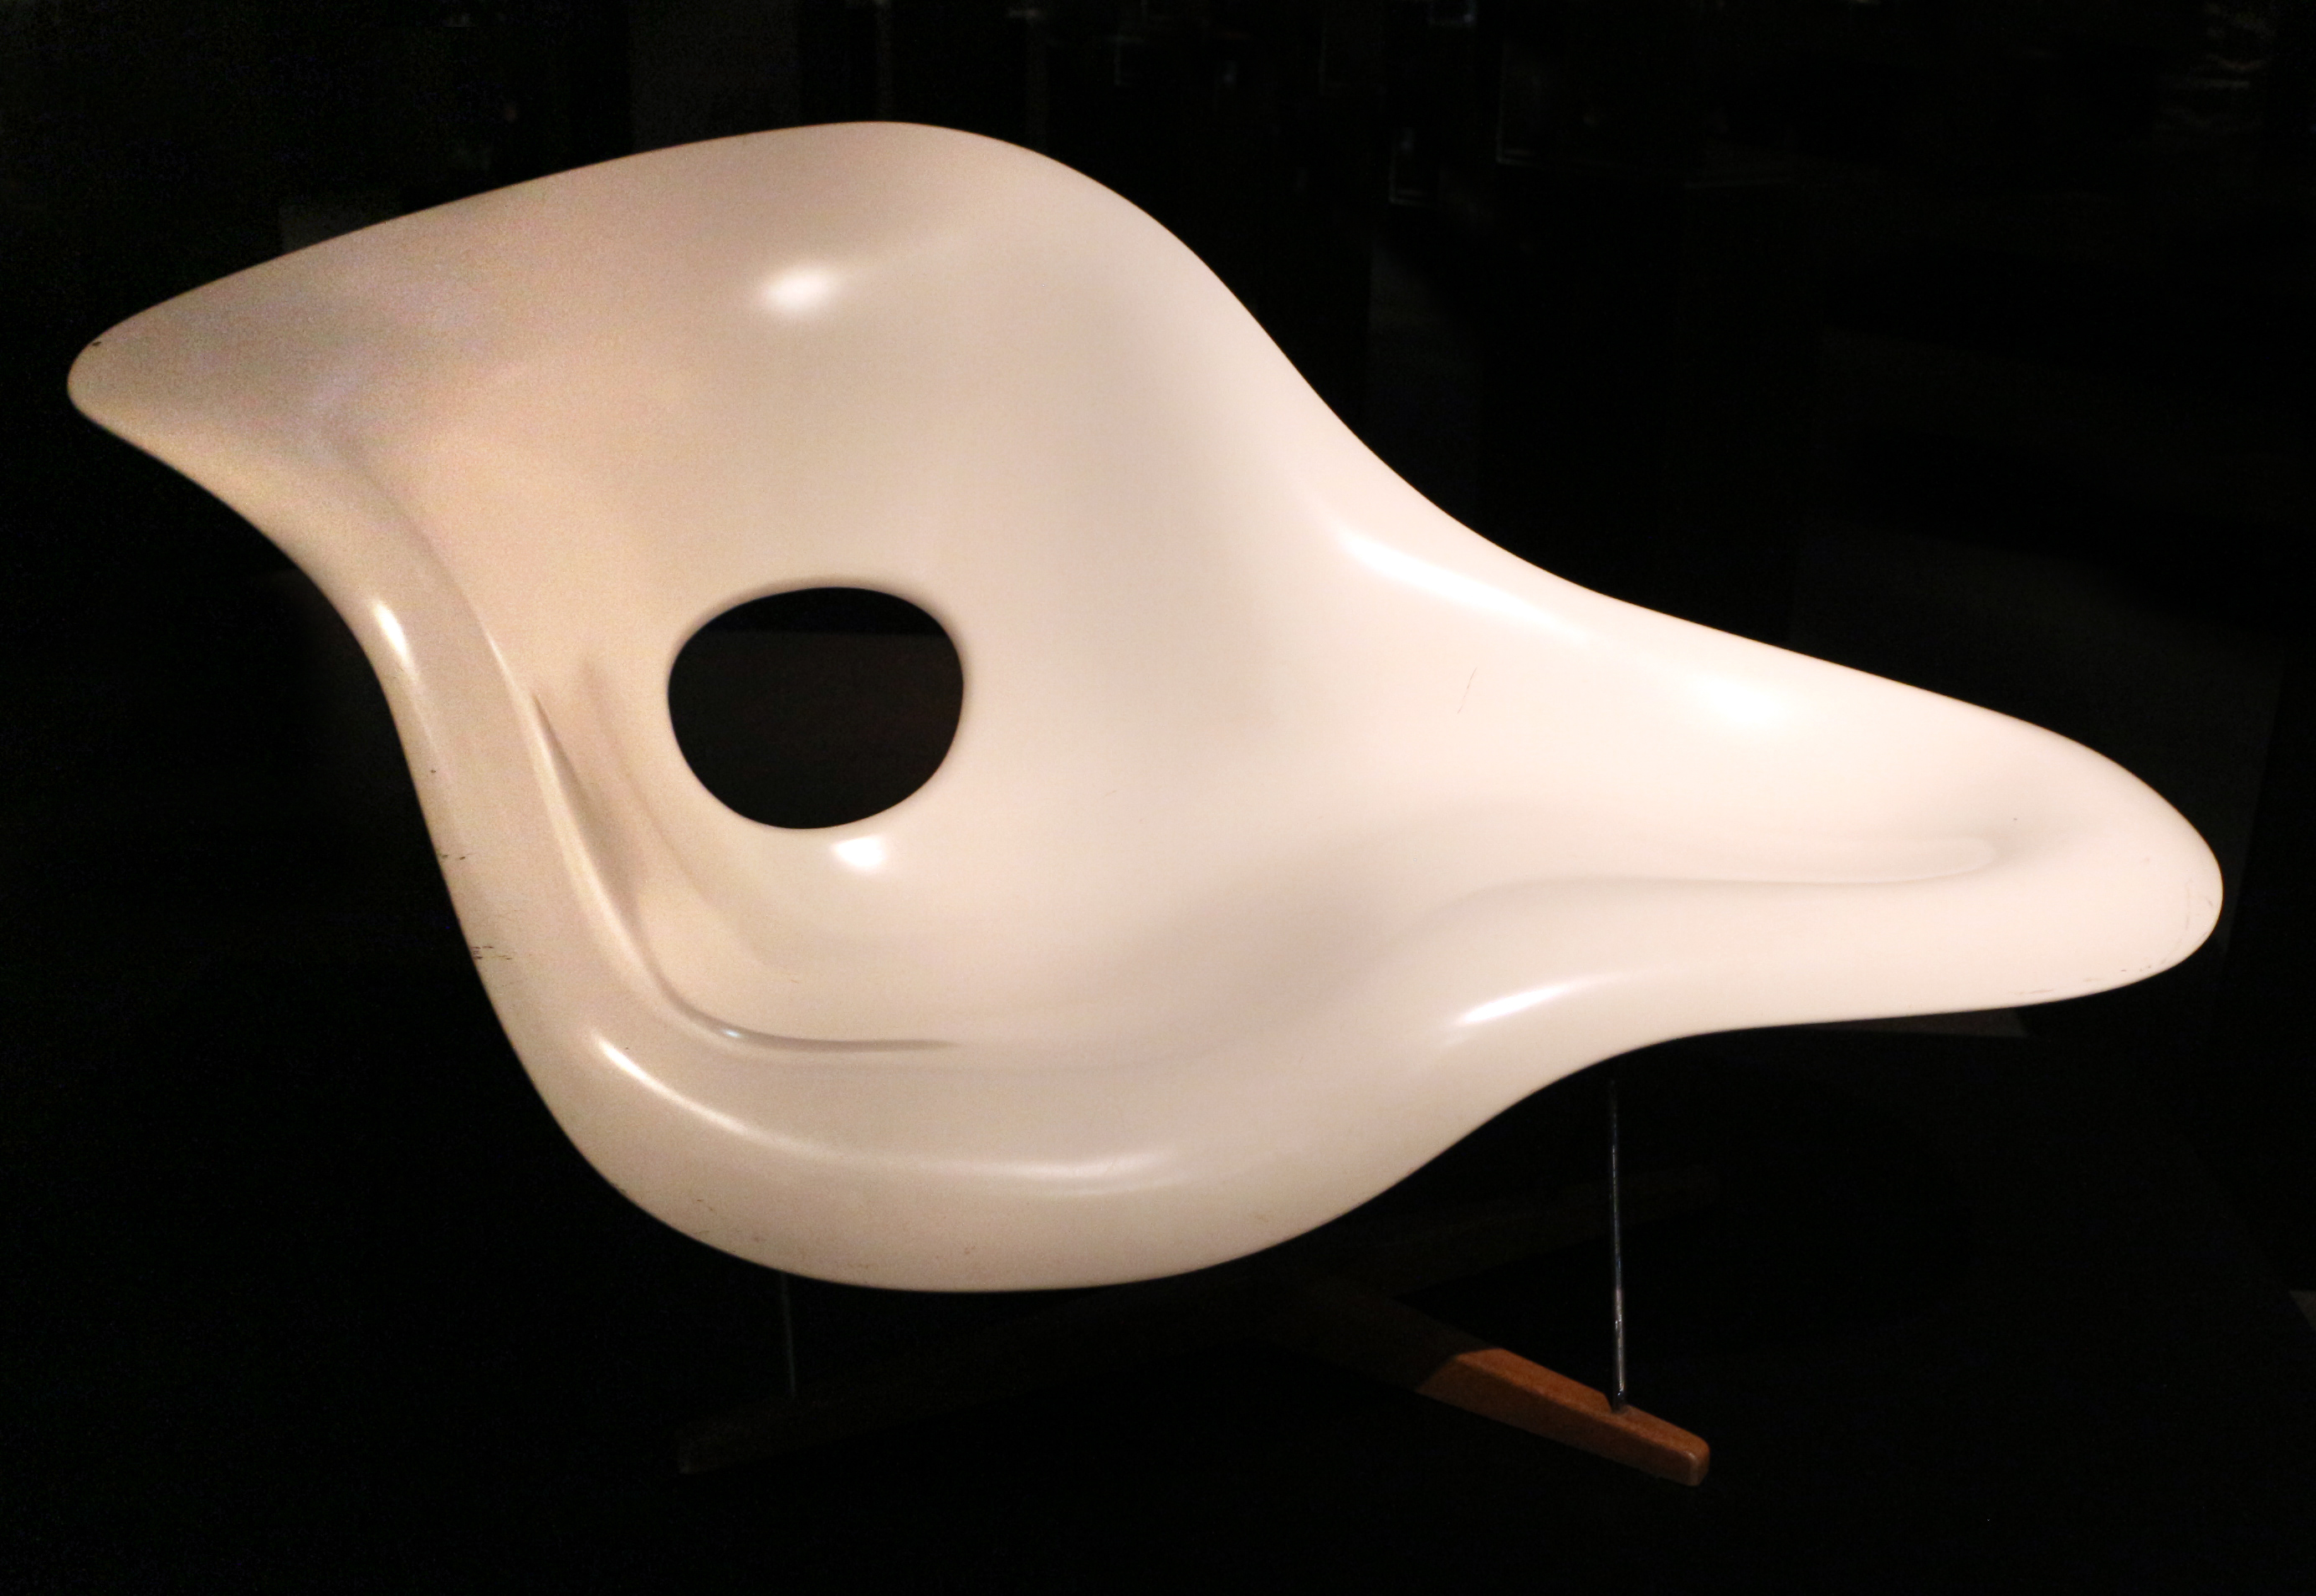 chaiselongue wikipedia File:Charles e ray eamer, chaise longue la chiase, 1948 (col. lorenza  branzi).jpg